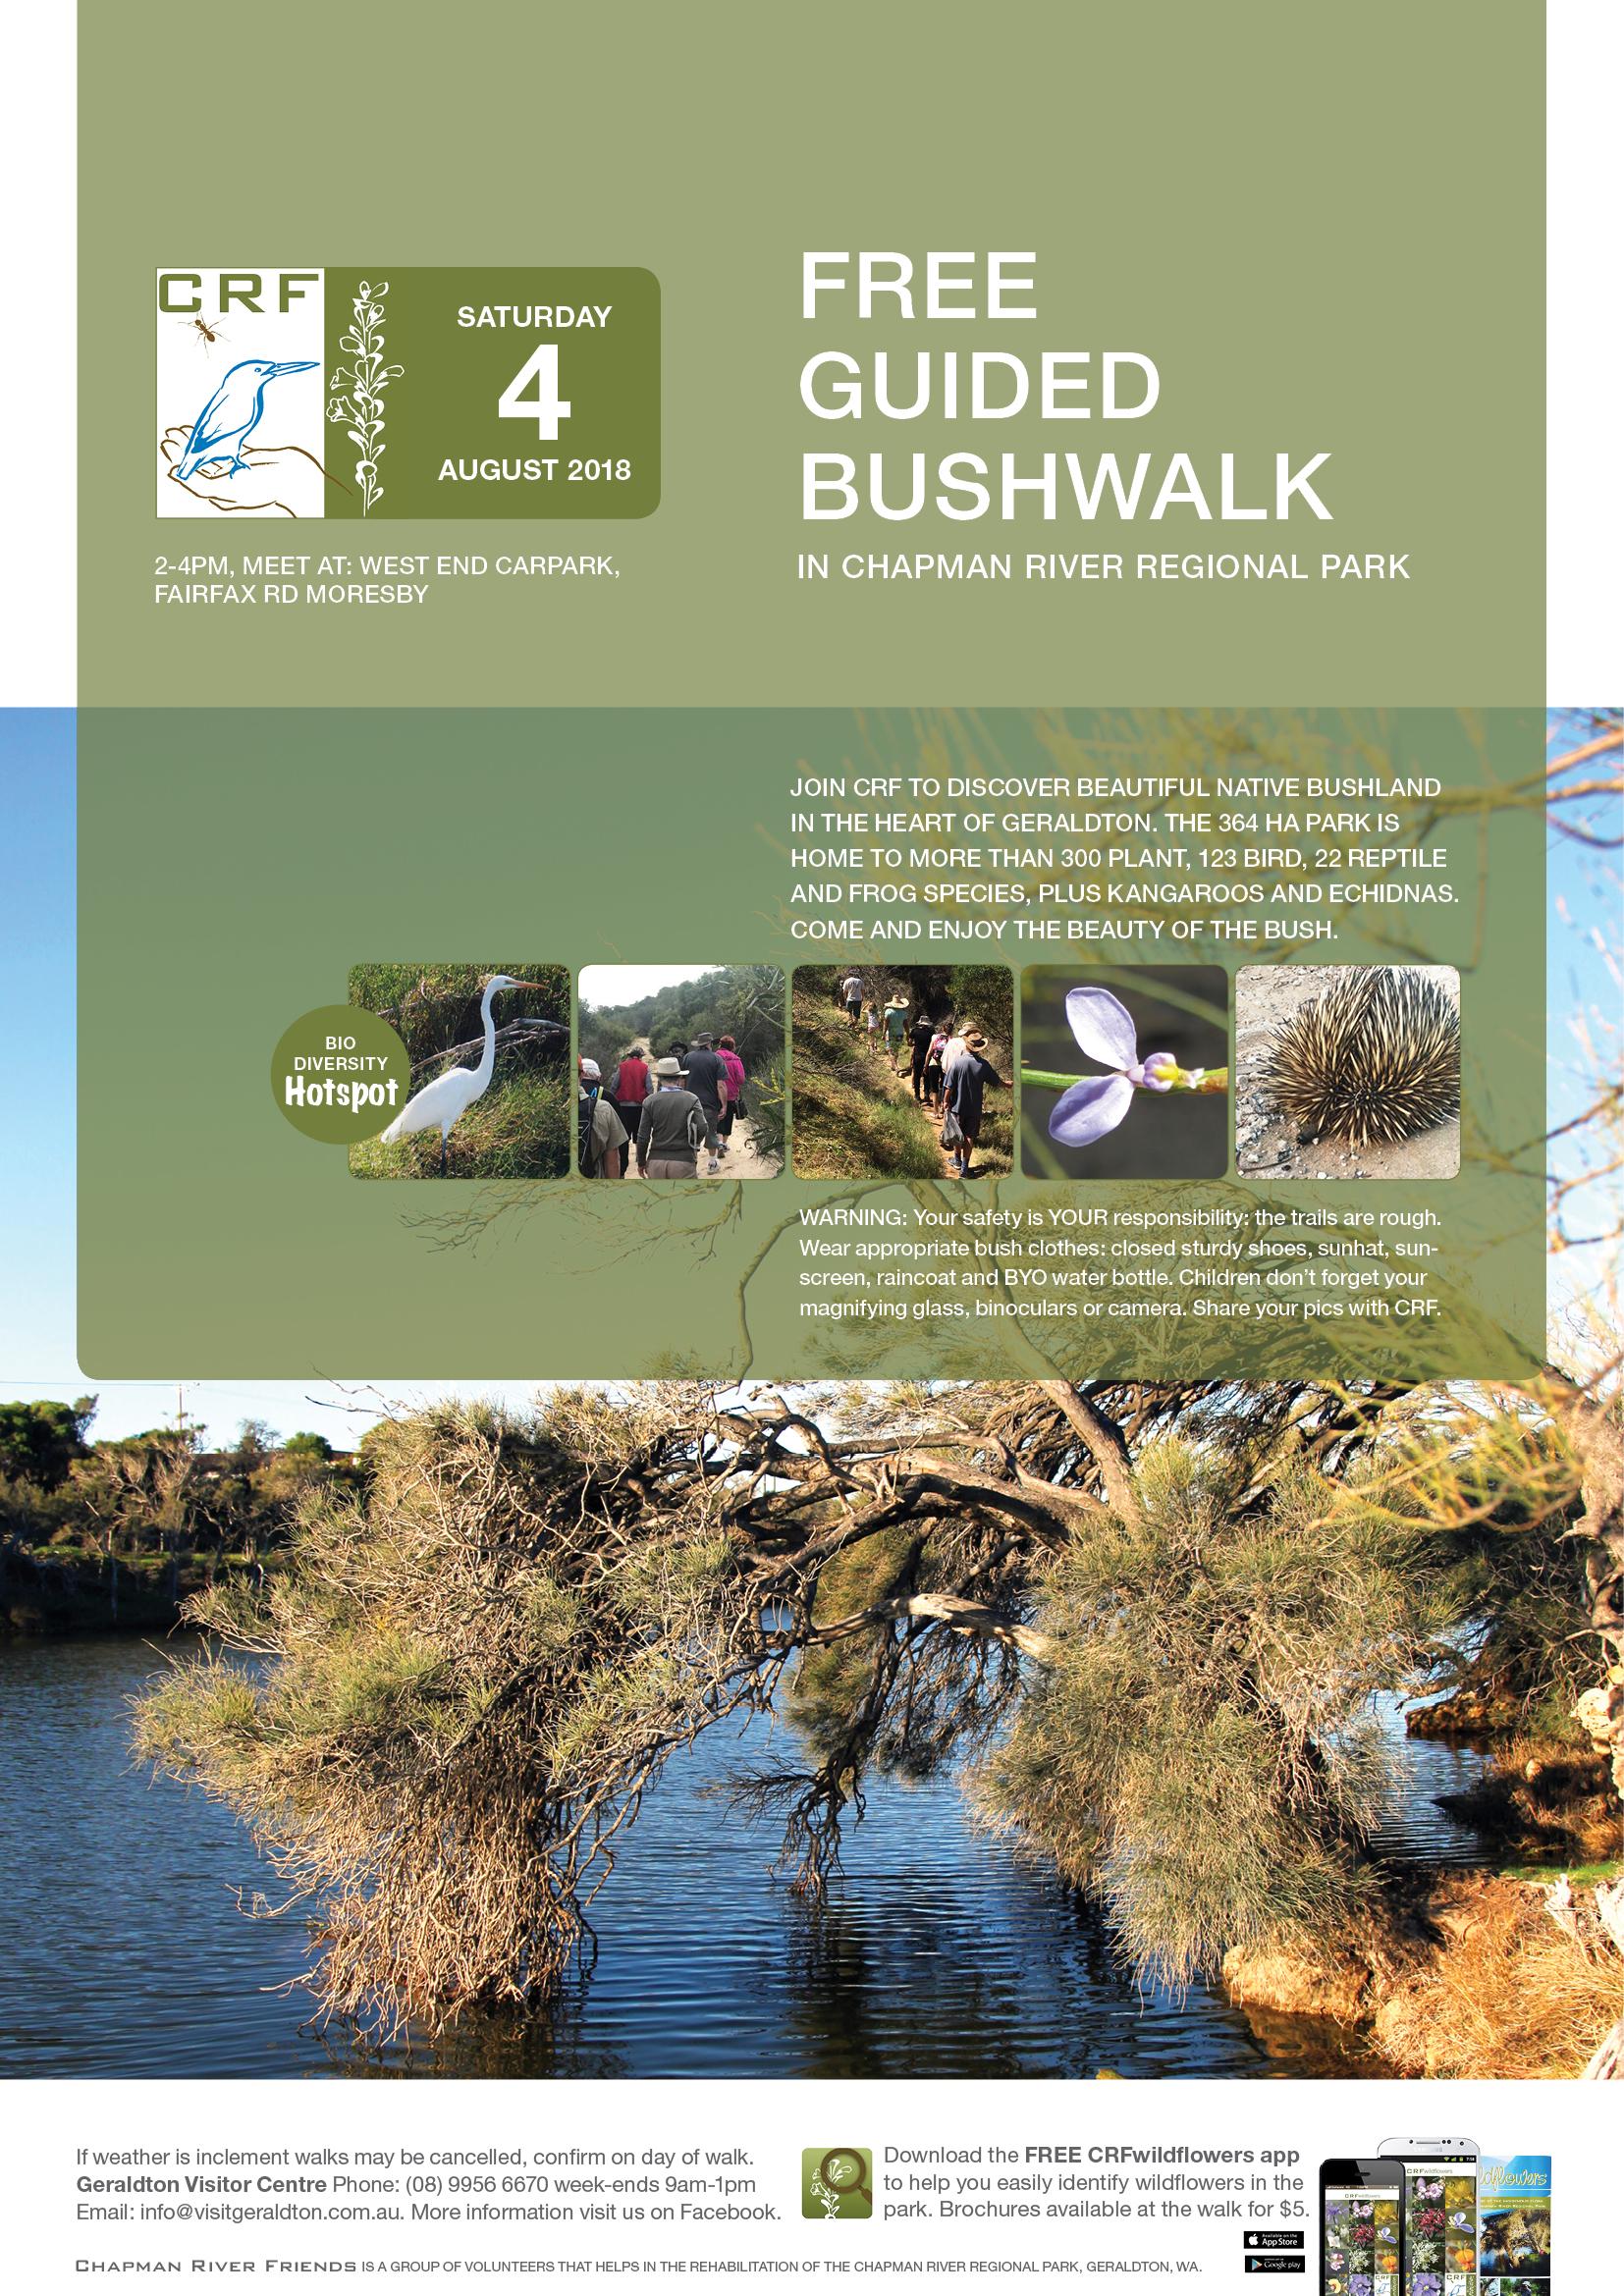 CRF FREE Guided Bushwalk Chapman River Regional Park